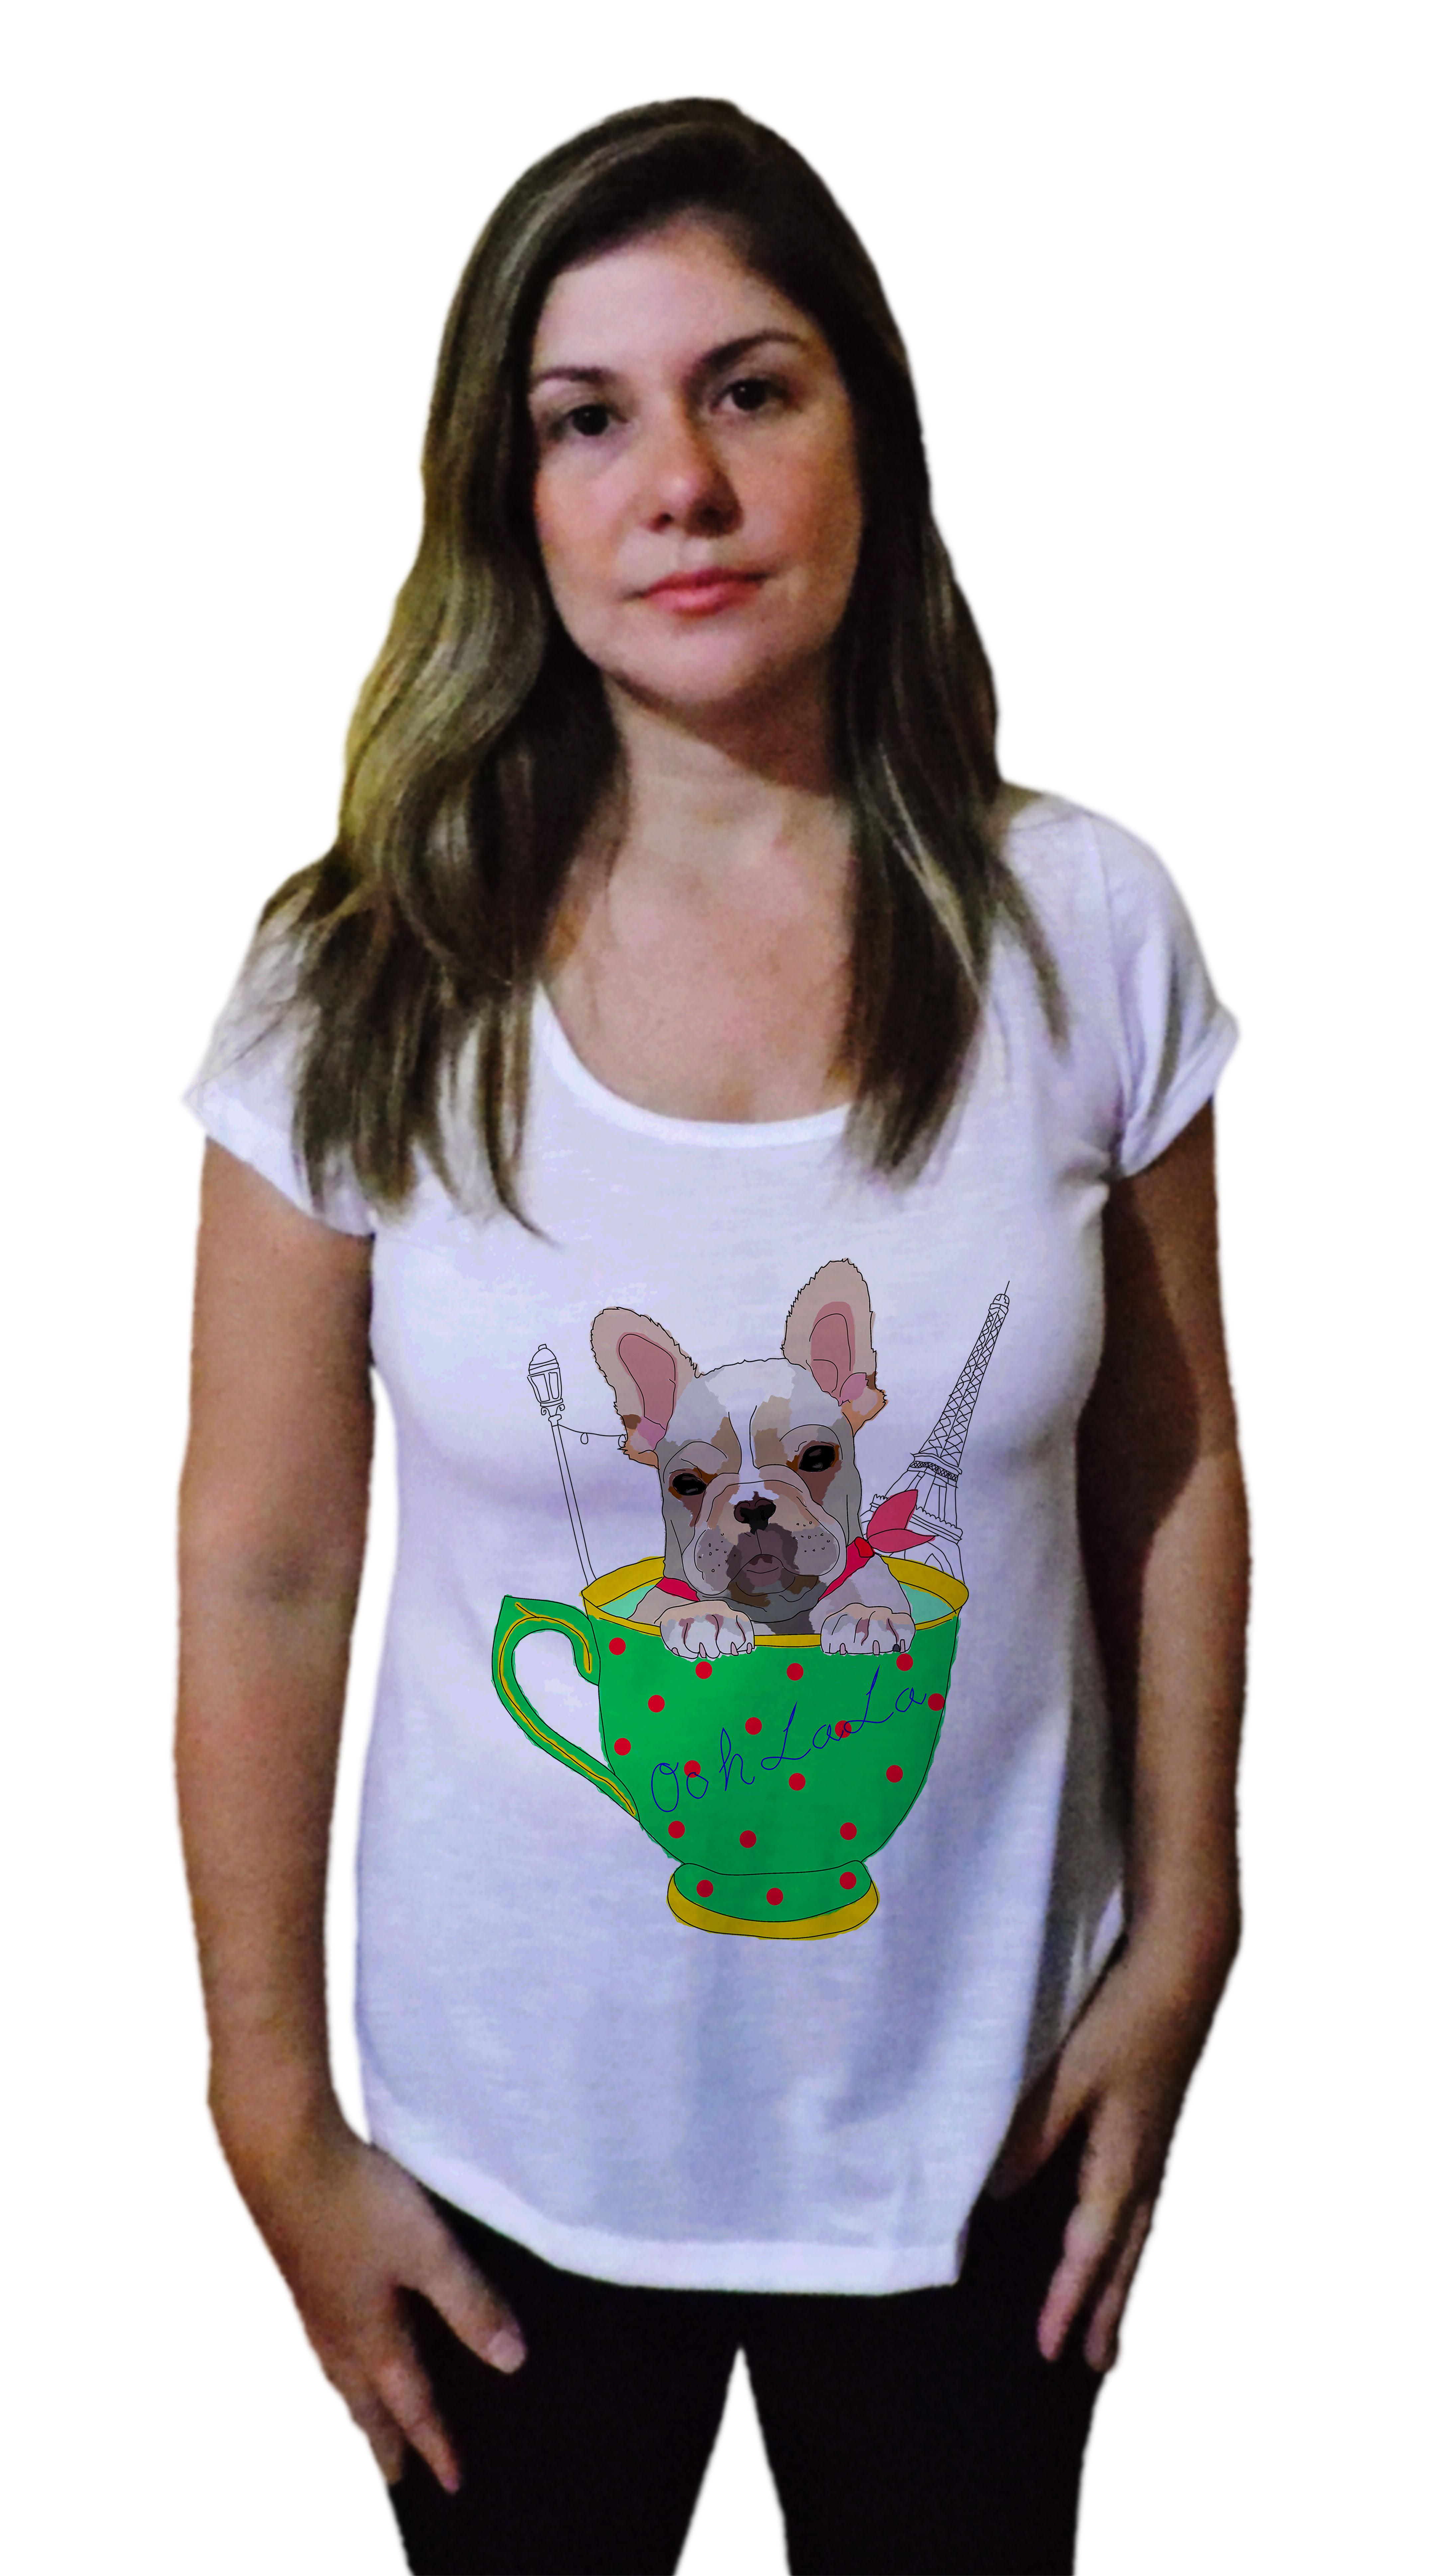 Camiseta Feminina Bulldog Frances Blusa Buldogue Paris  27764cfb4e1a6